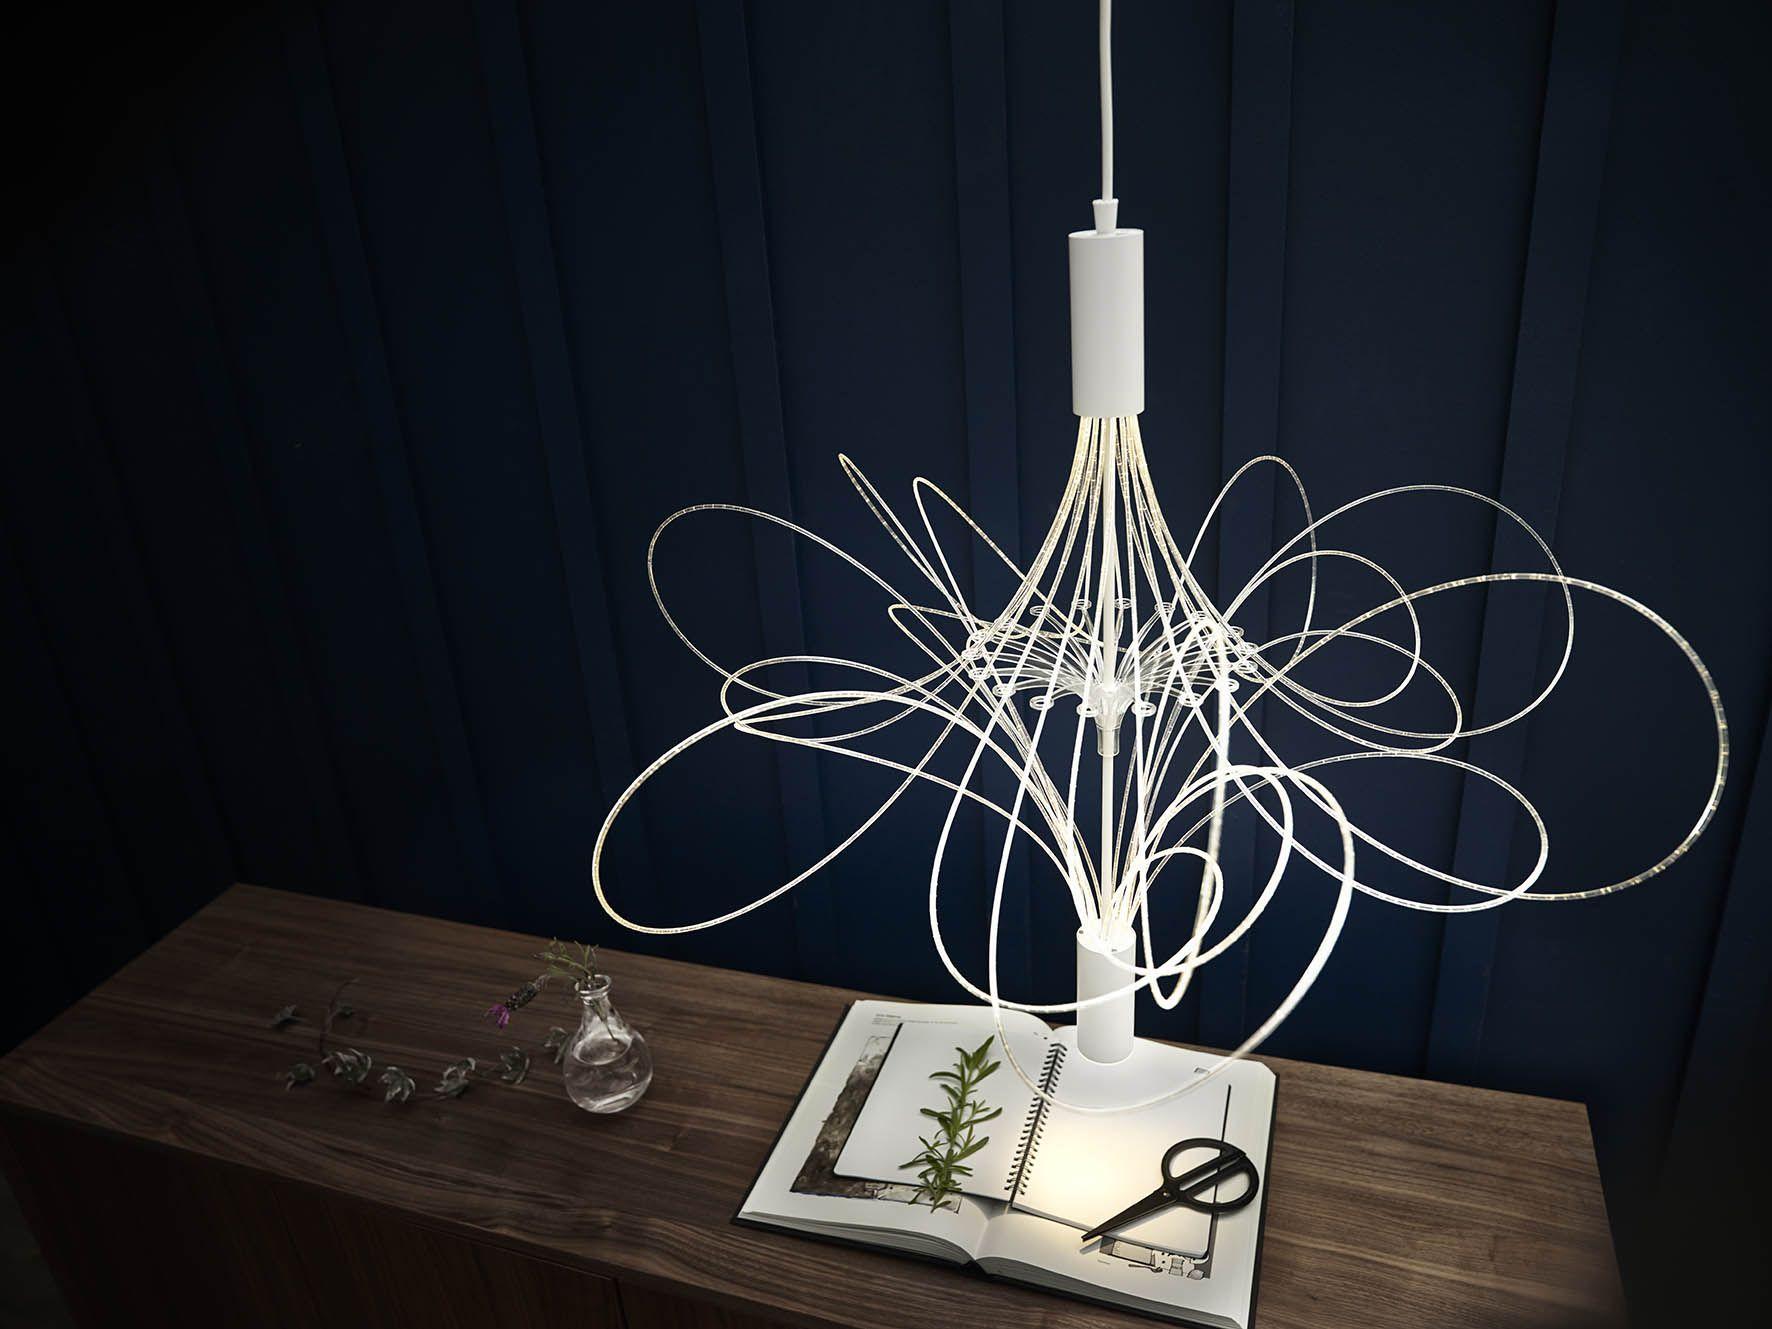 IKEA ALVSBYN LED hanglamp Moderne kroonluchter | Interieur door ...